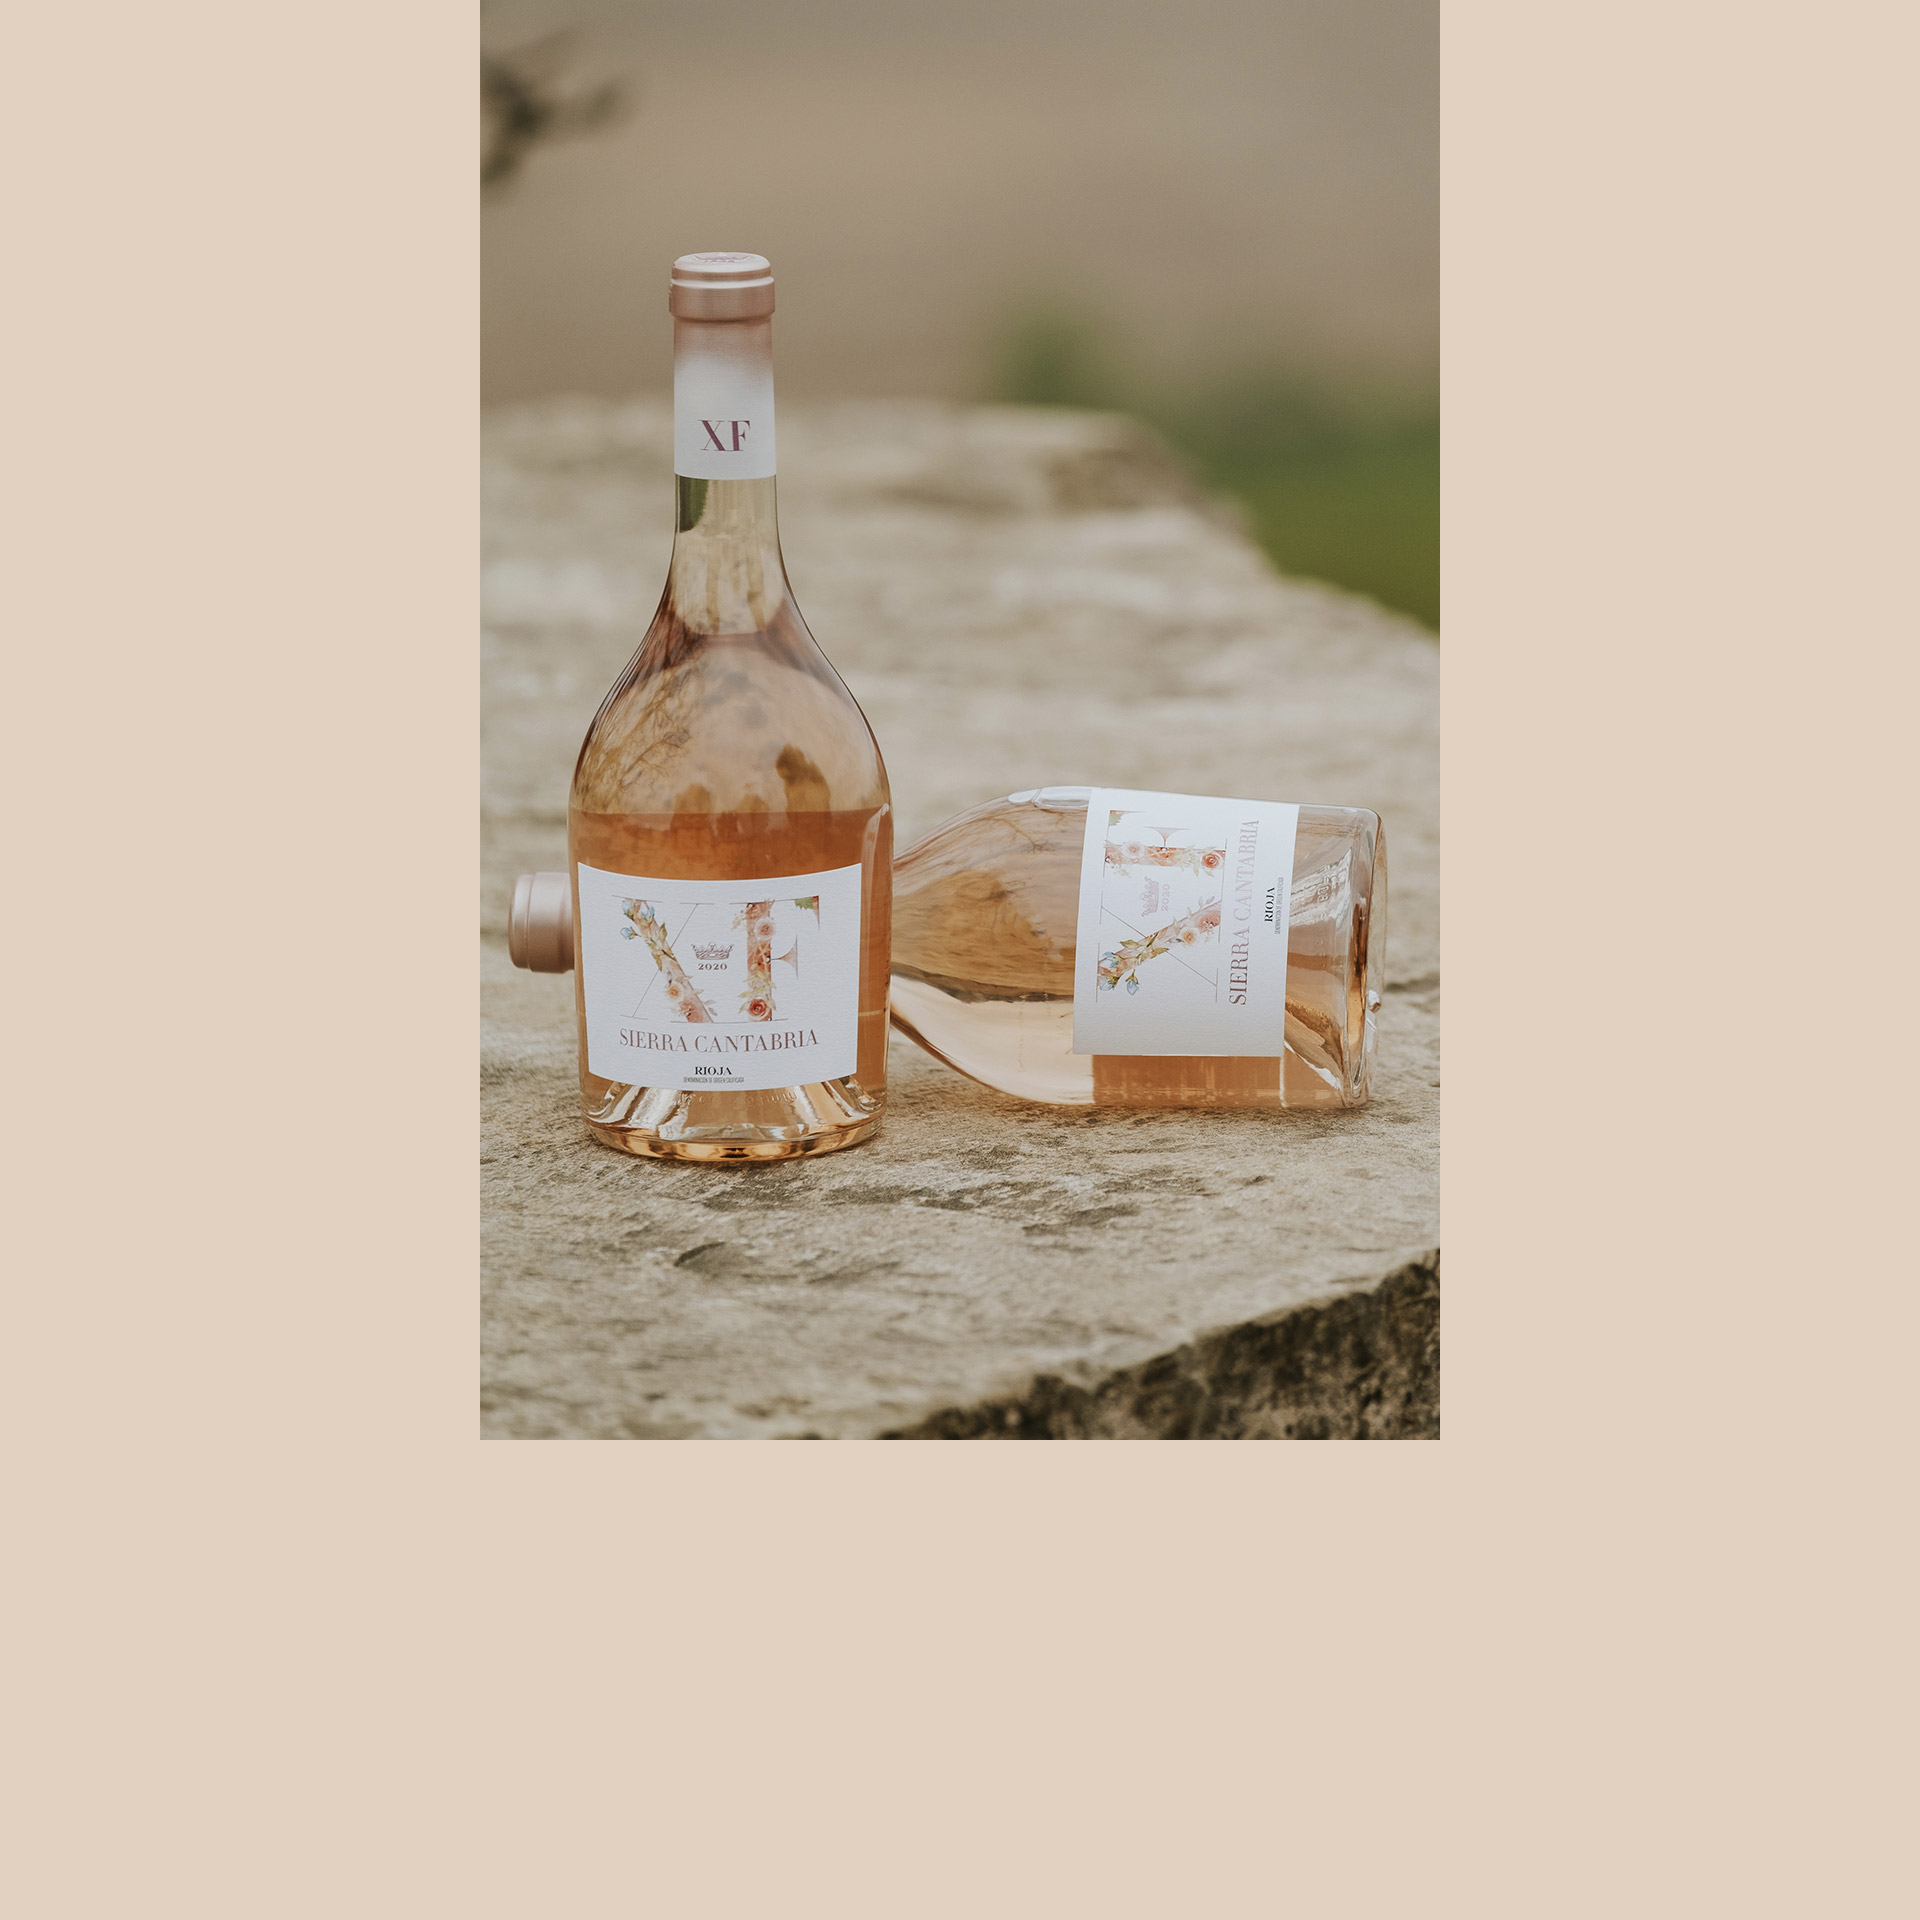 Design packaging label rose wine XF Sierra Cantabria